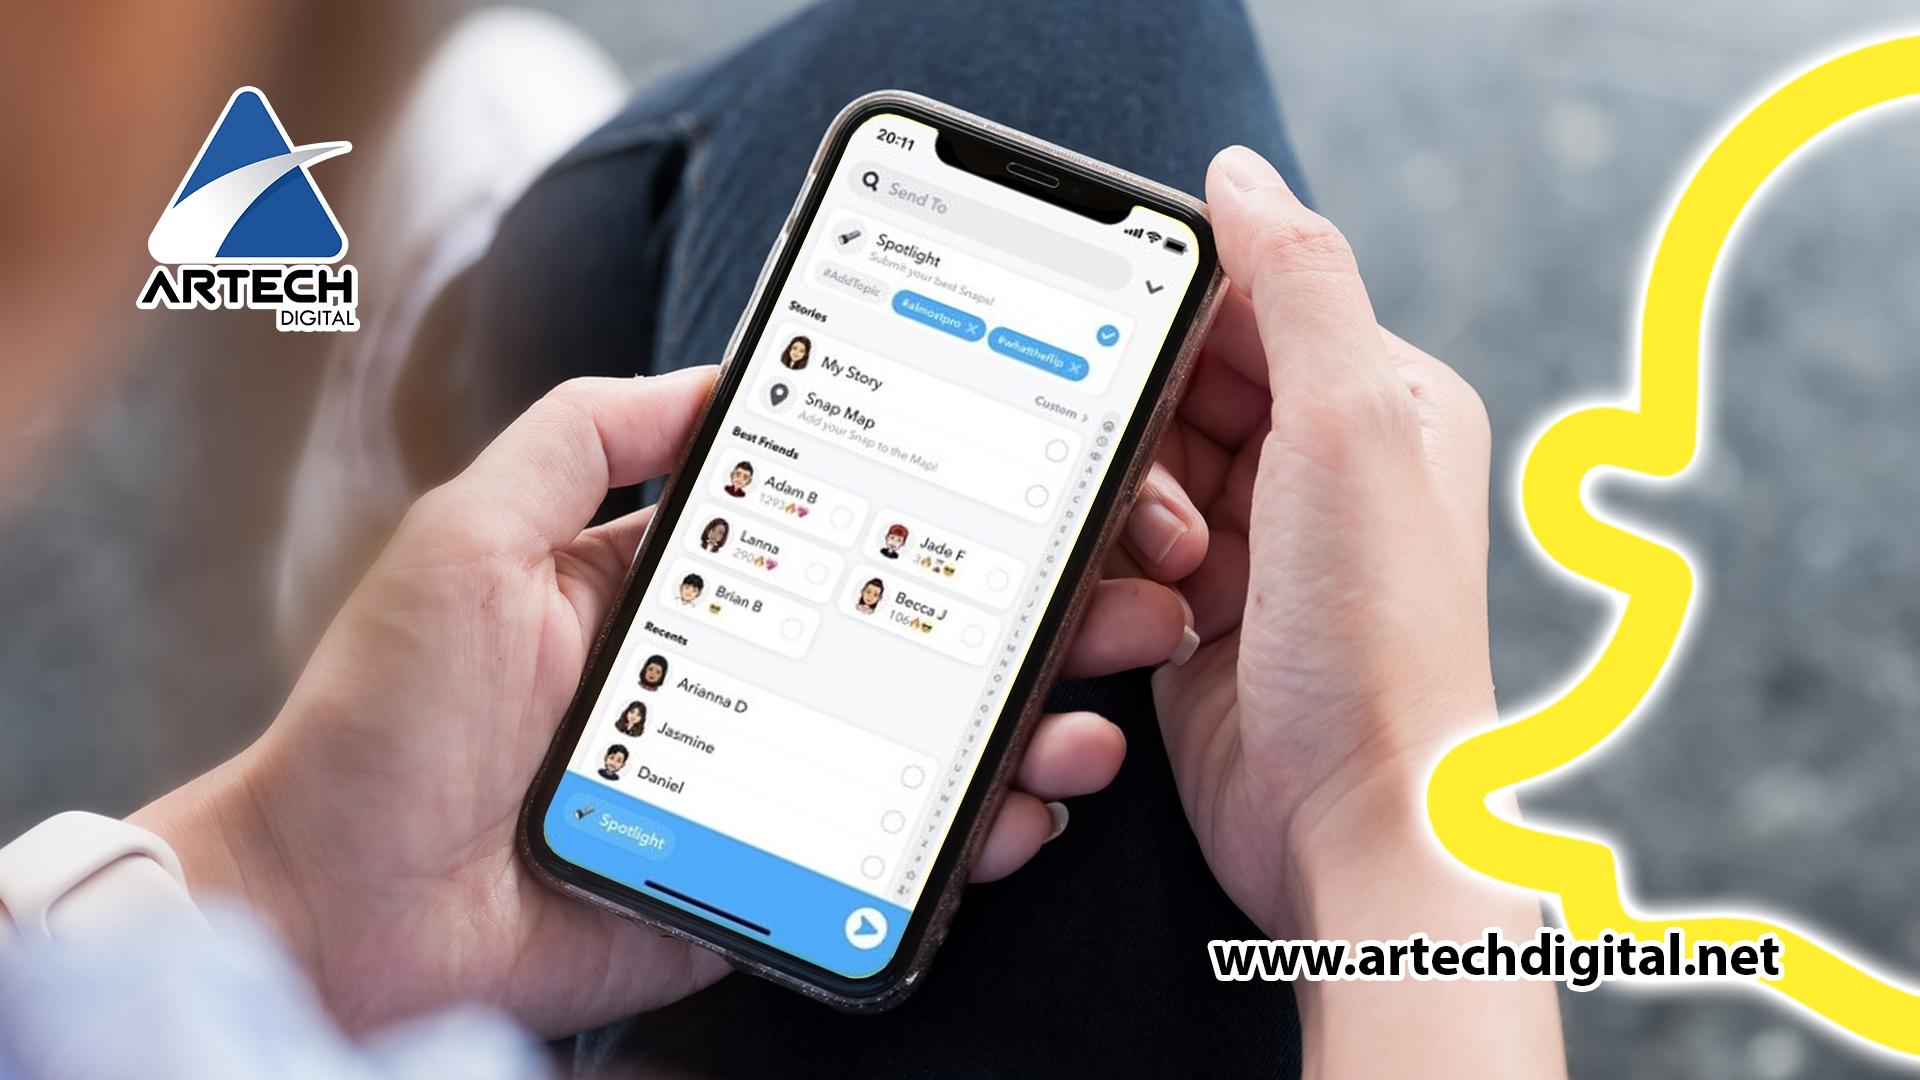 New Snapchat feature - Artech Digital